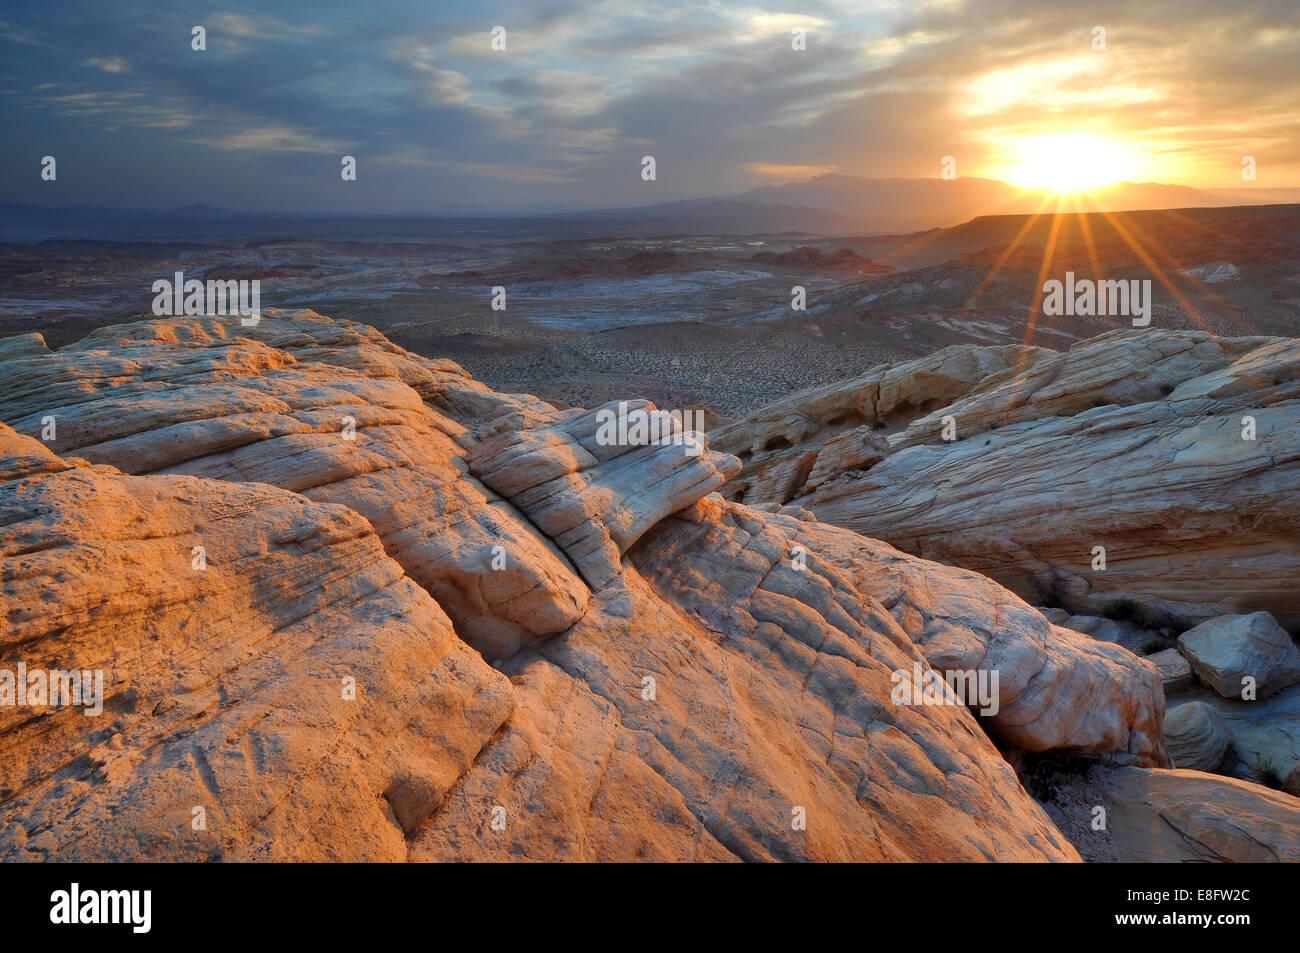 USA, Nevada, Valley of Fire State Park, Sunrise in Desert - Stock Image